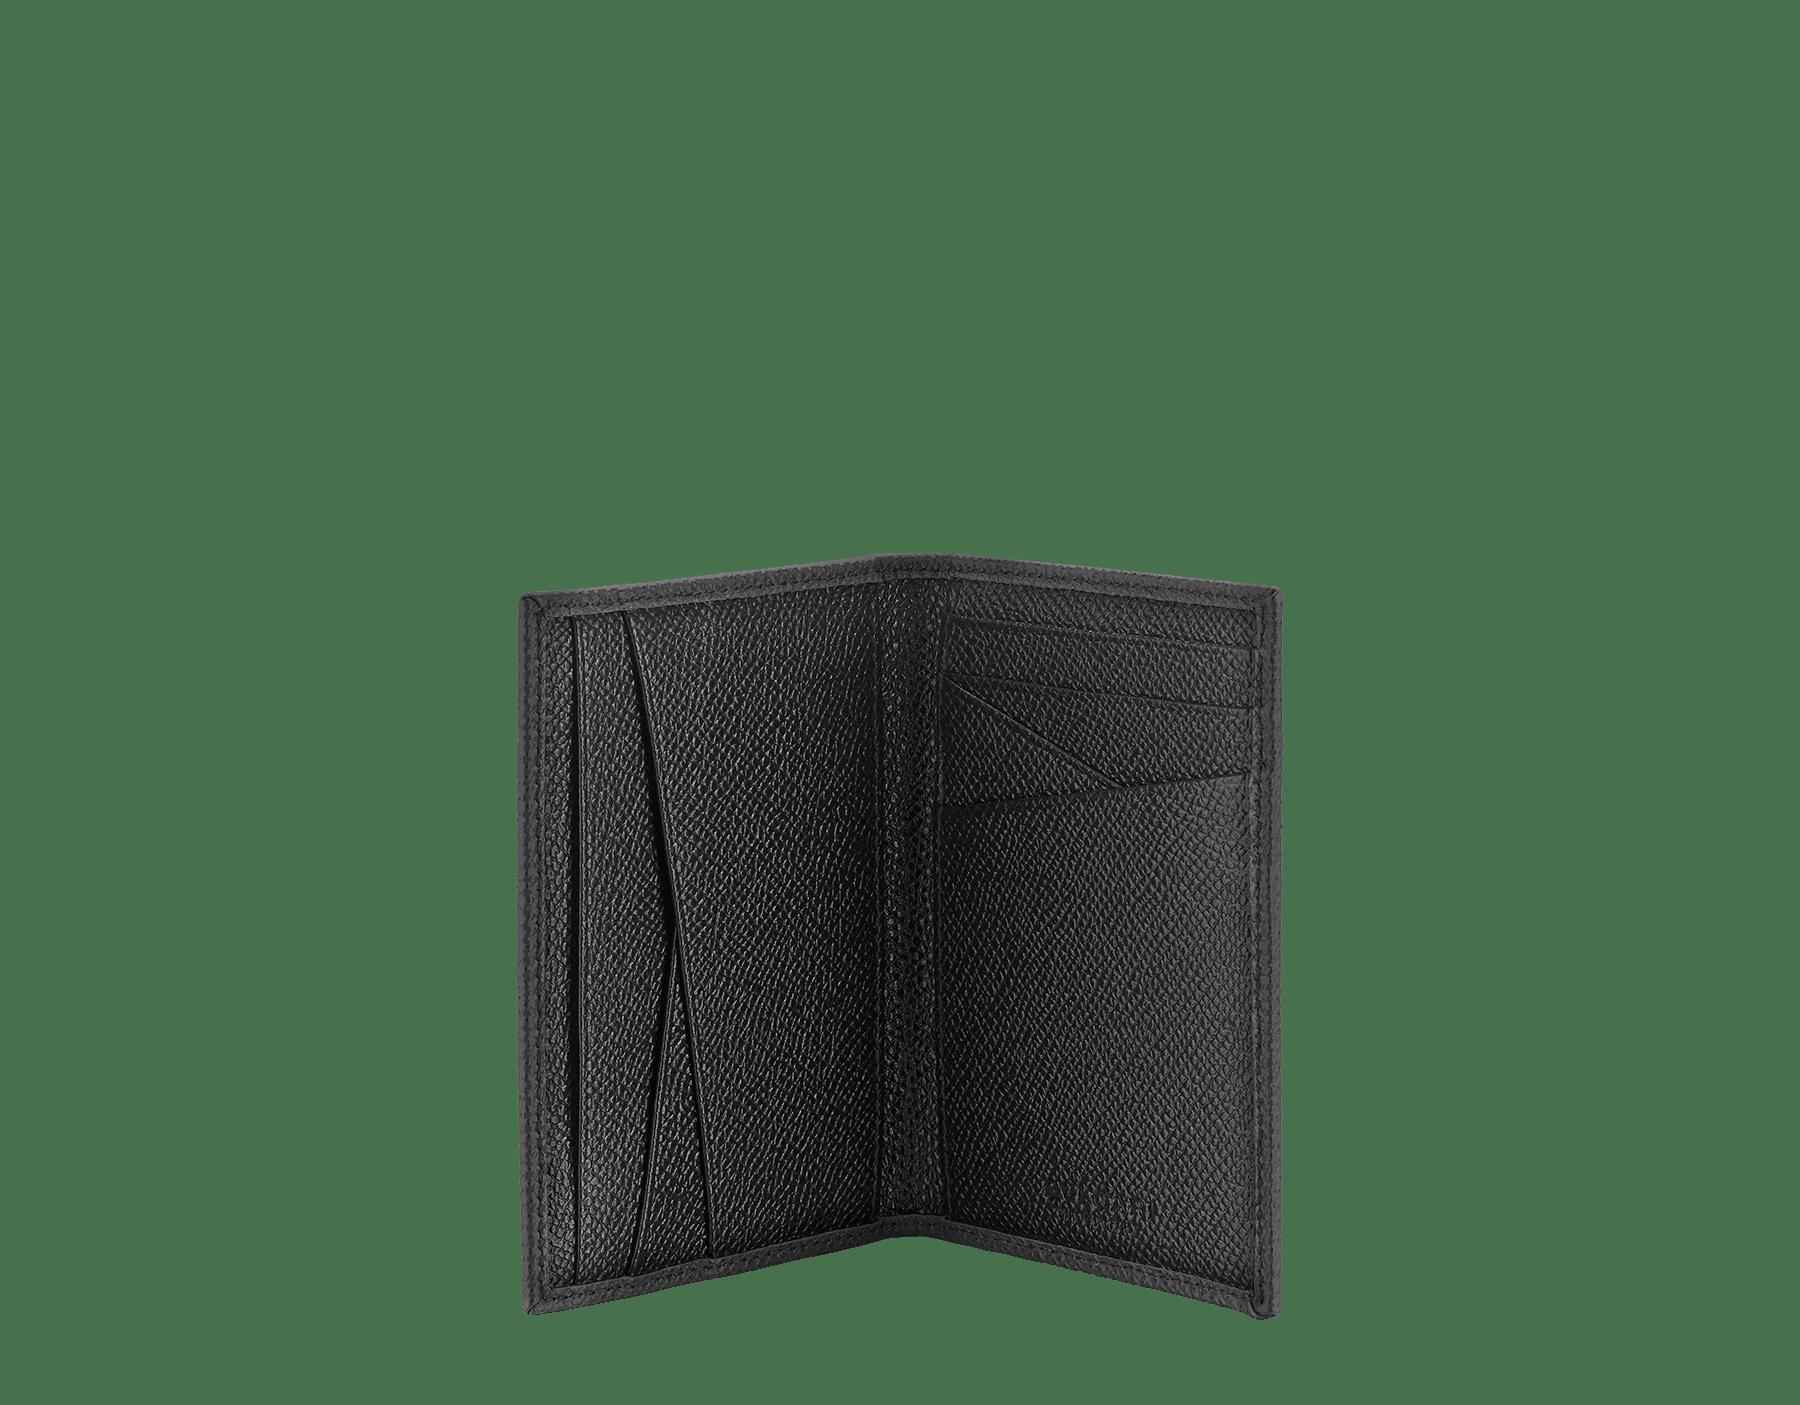 """BVLGARI BVLGARI MAN"" folded card holder in capri turquoise and royal sapphire grain calf leather with brass palladium plated BVLGARI BVLGARI motif. BBM-VERTICALCCHgcl image 2"